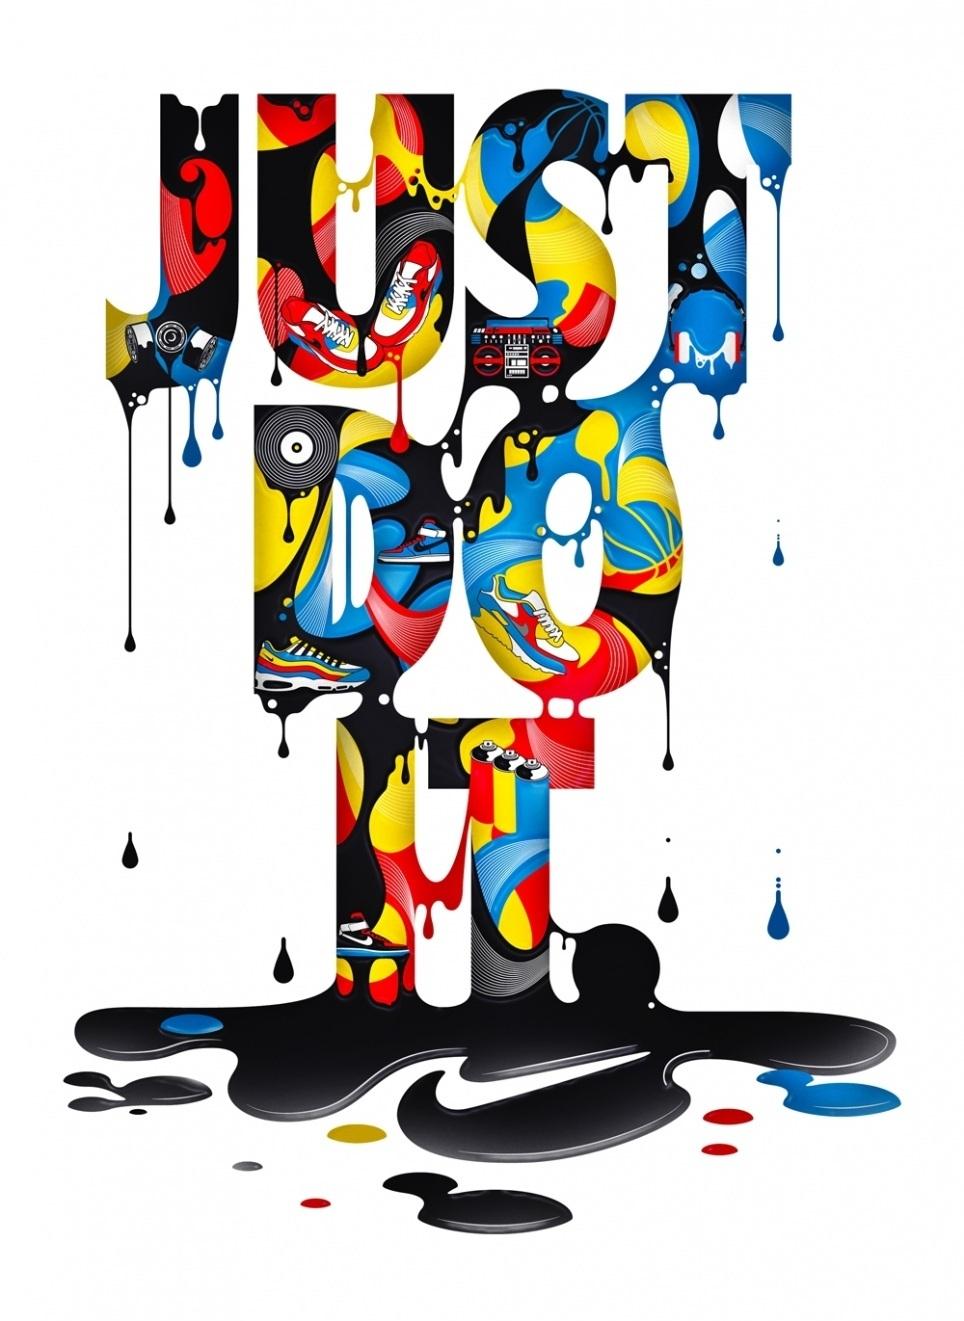 Nike Just Do It Wallpaper Mobile Sdeerwallpaper 964x1321